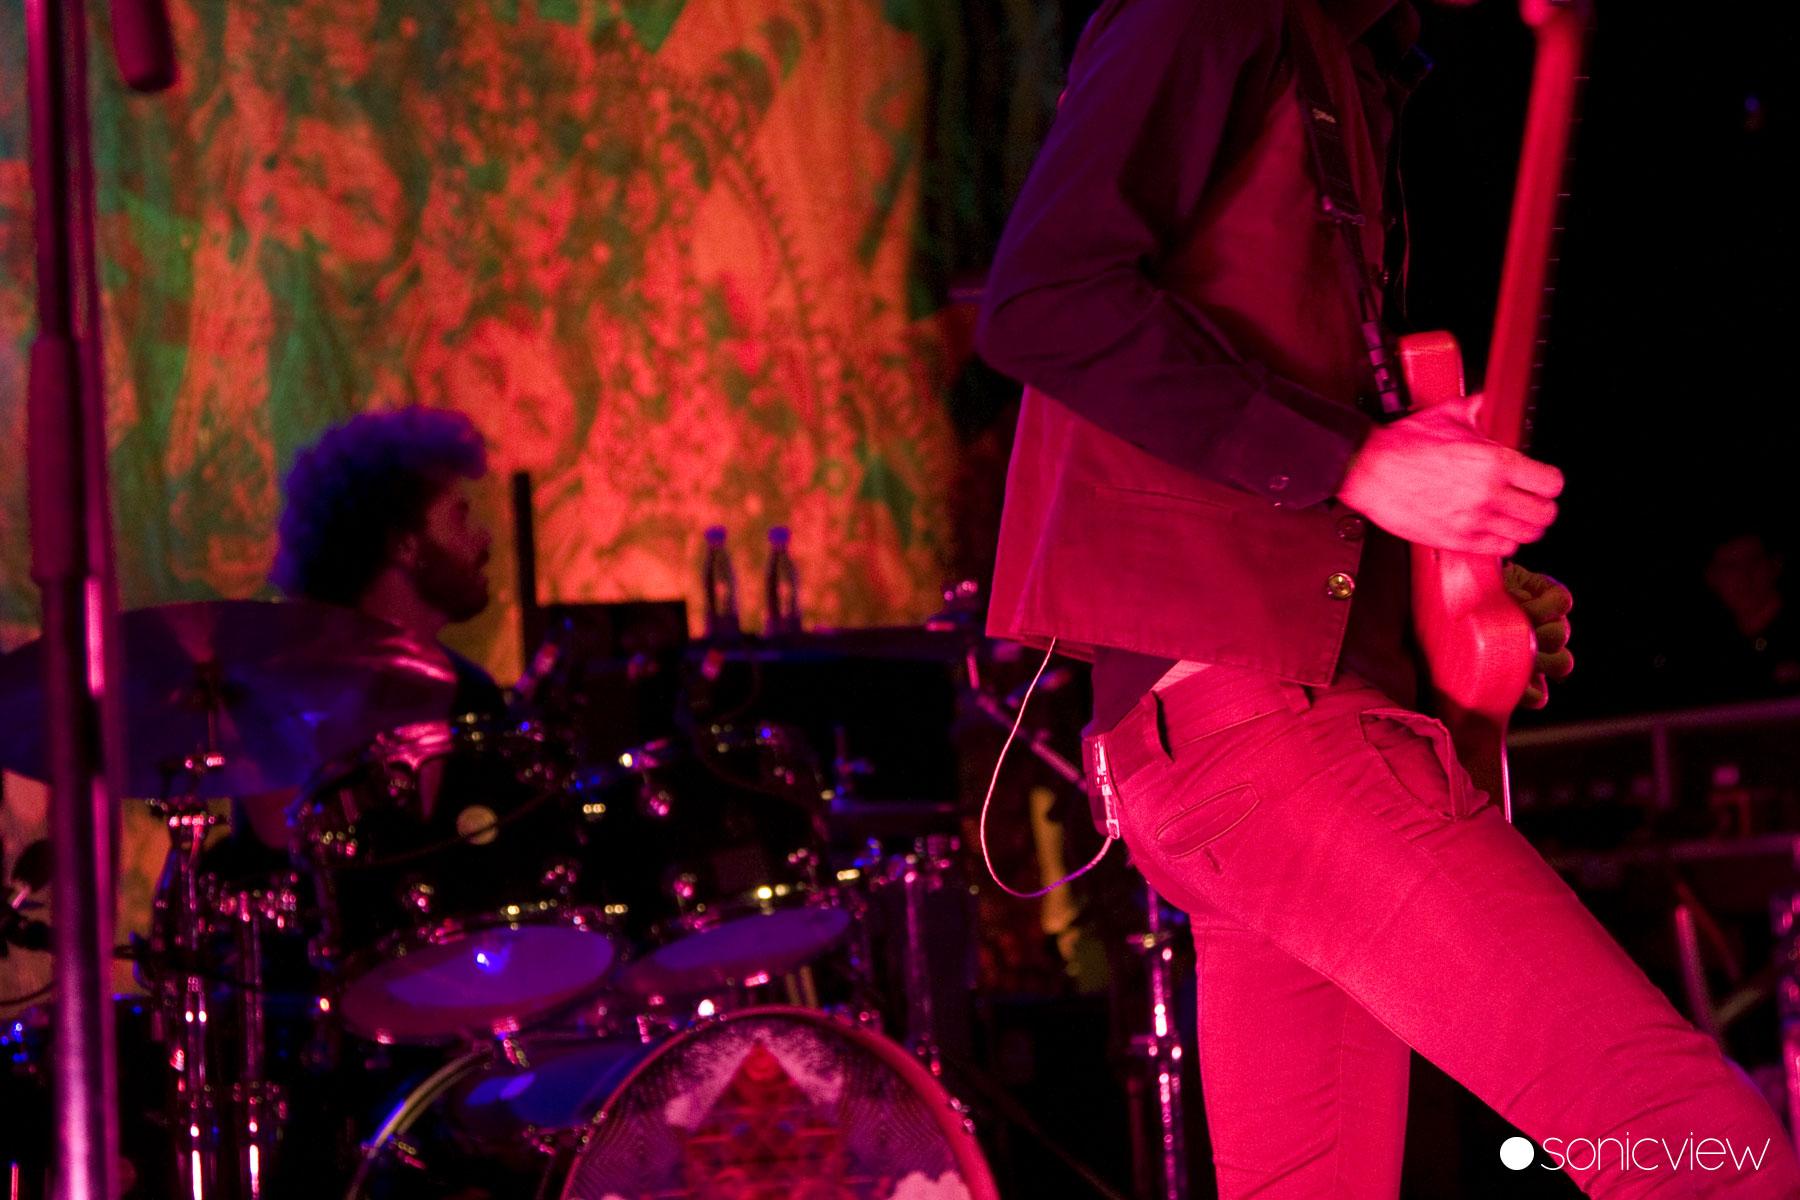 Mars Volta: Live at Vega 2009, Copenhagen, Denmark